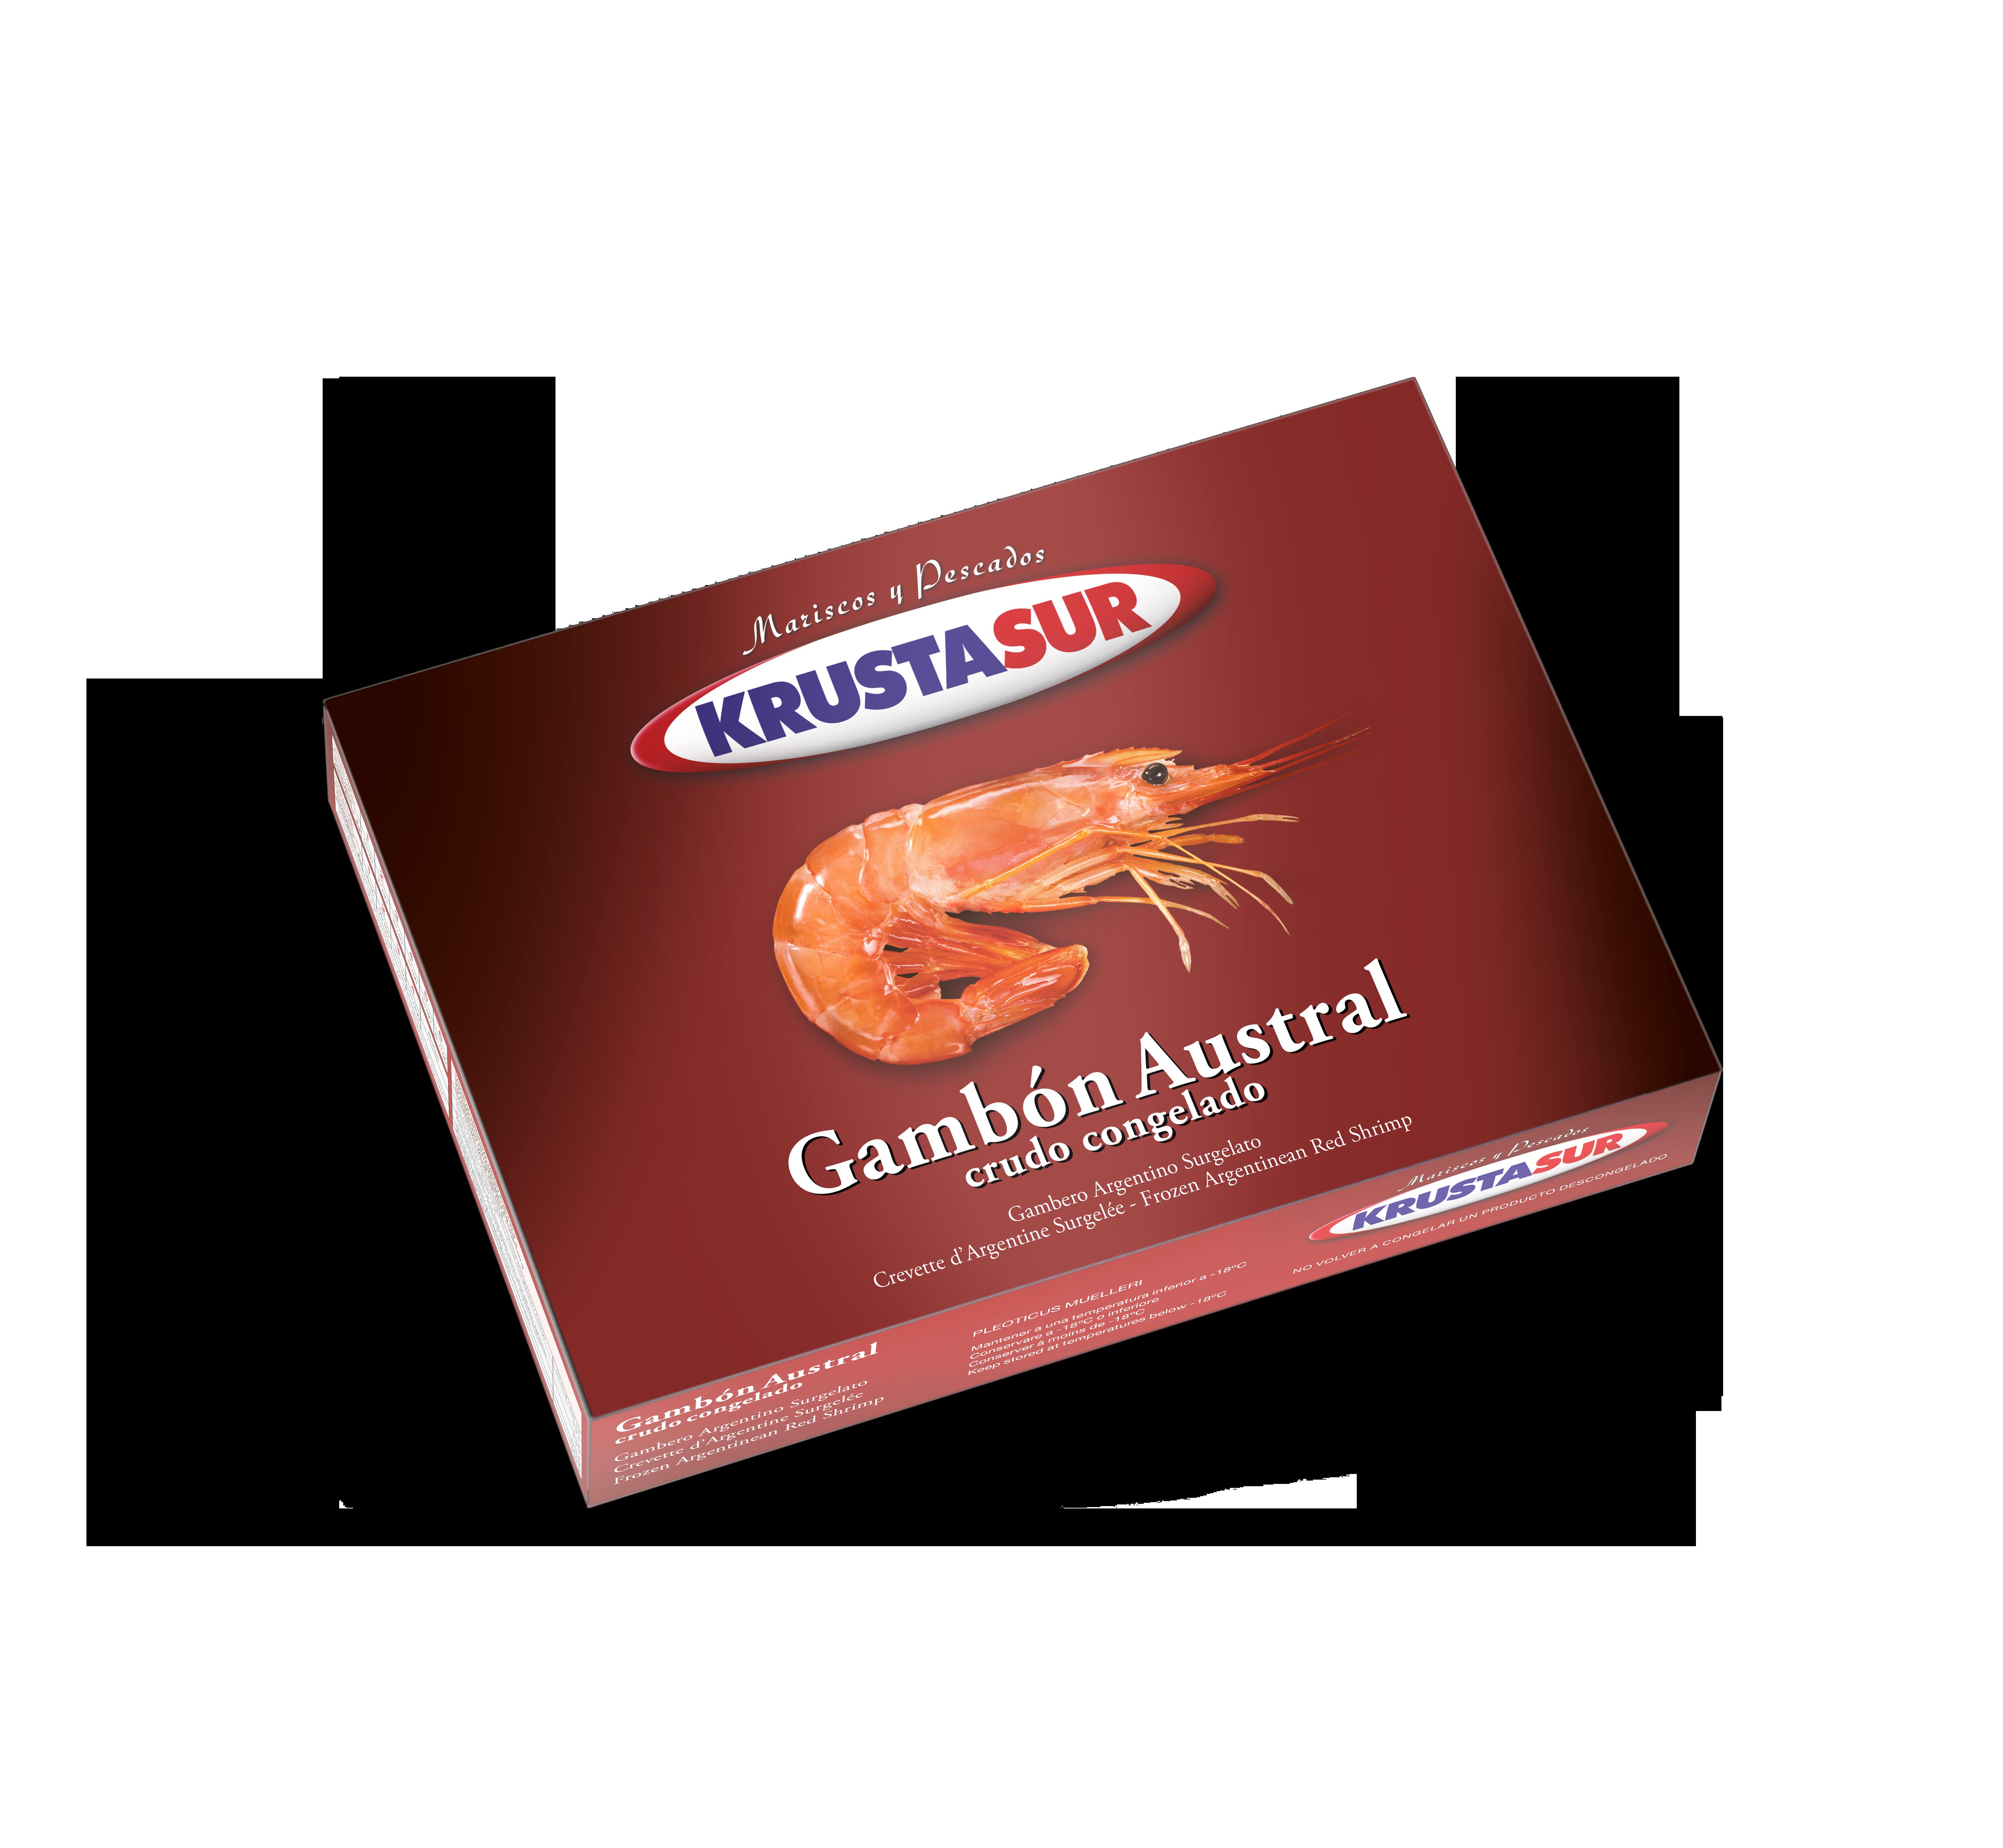 Krustasur land frozen red shrimp Image